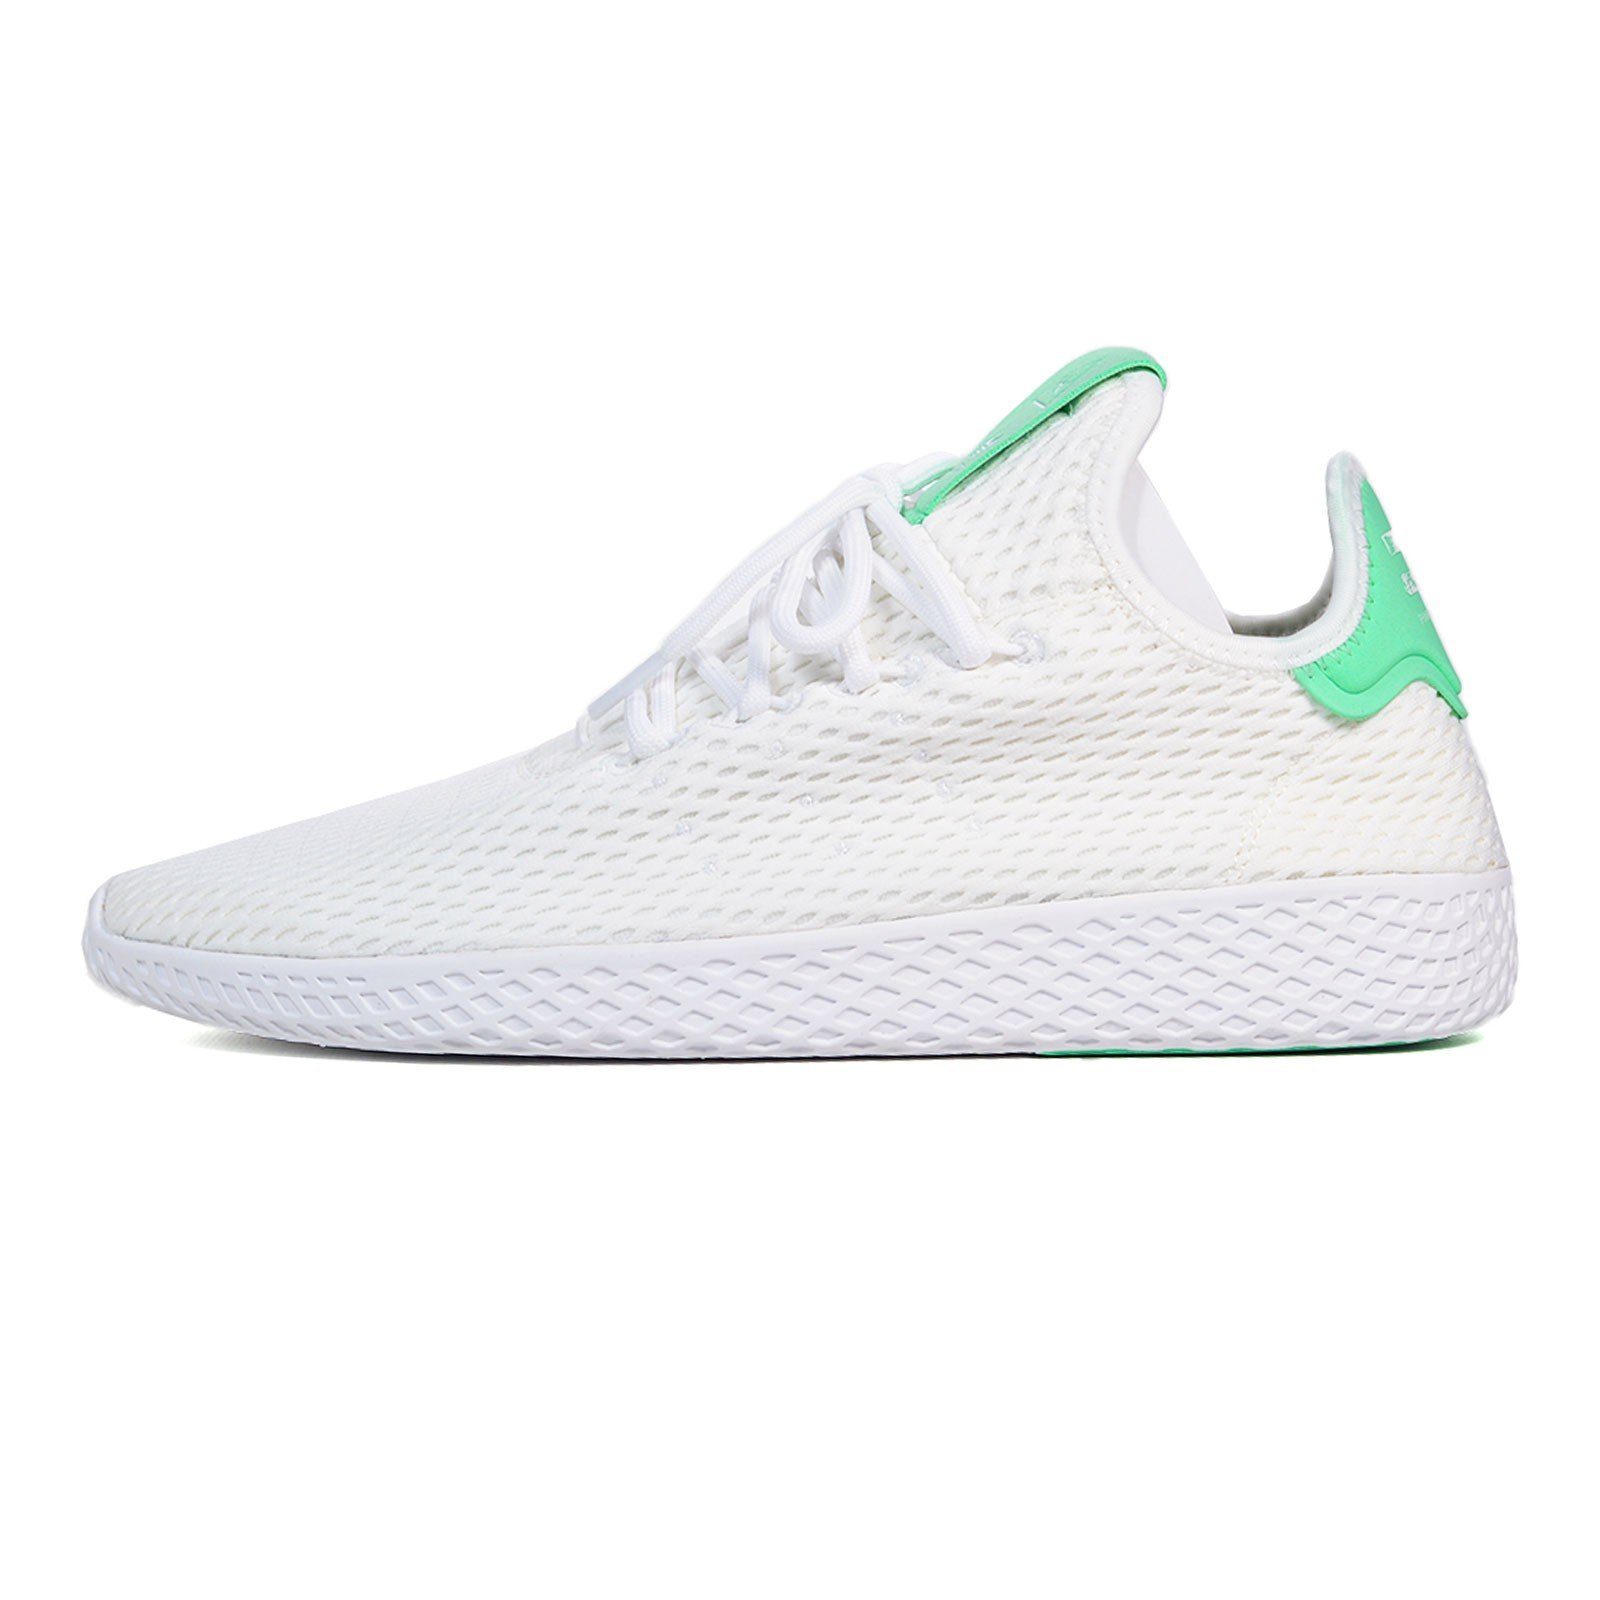 adidas PW Tennis Hu in White/Green Glow, 4